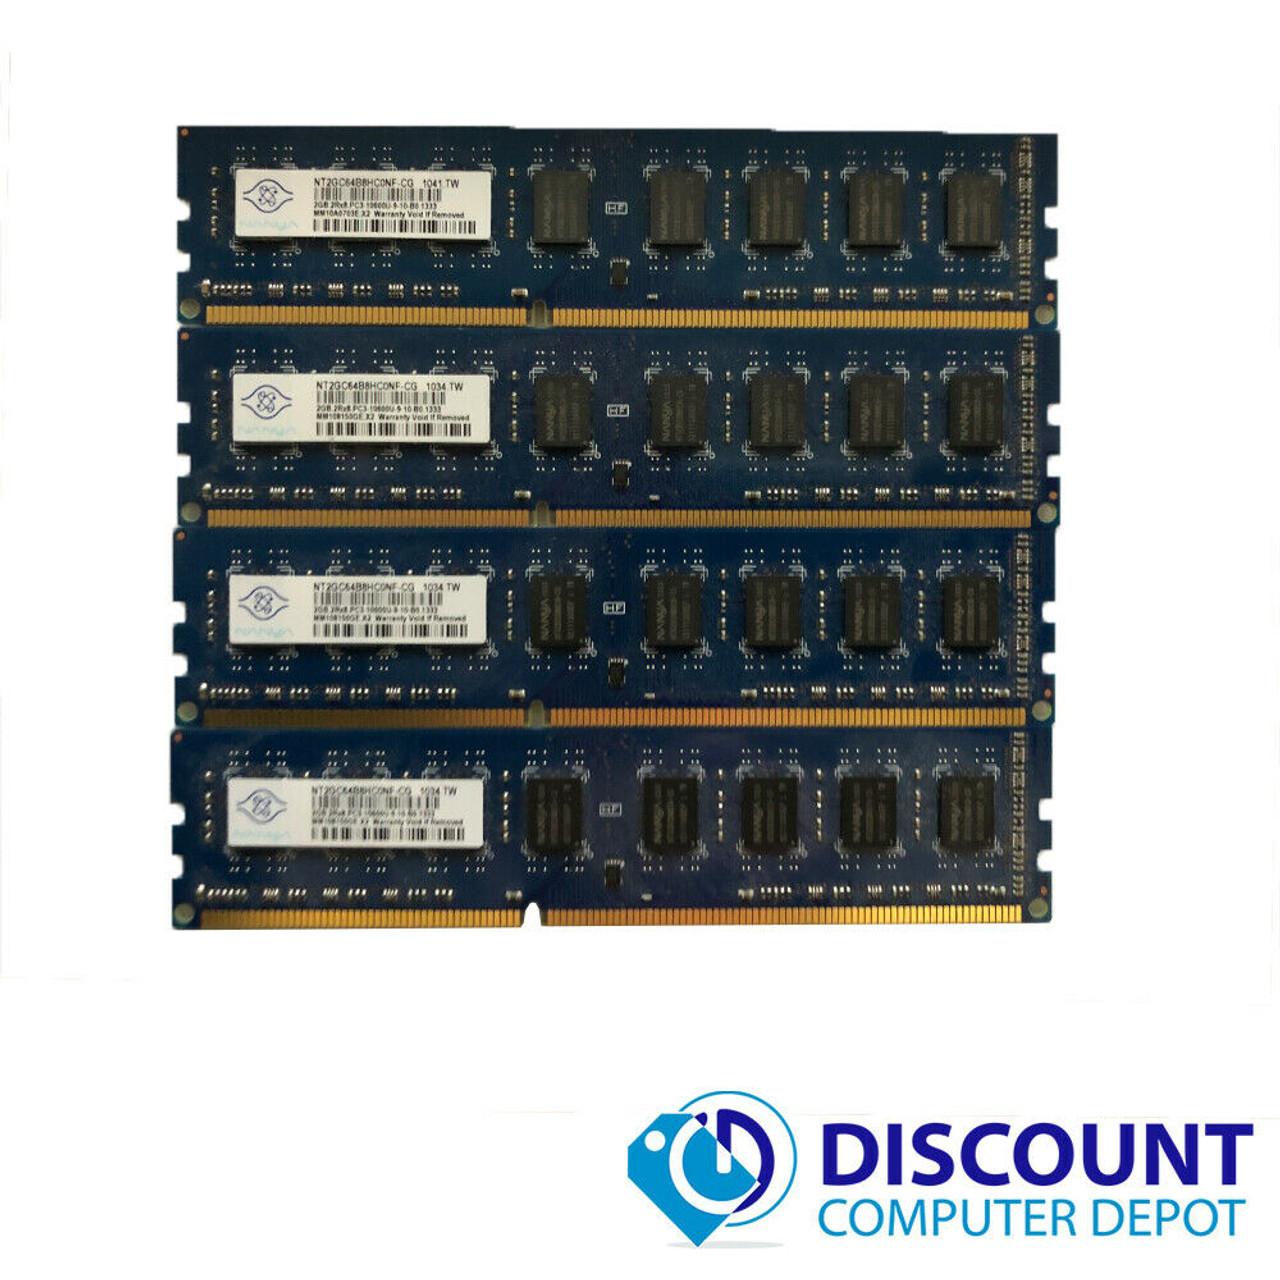 16GB 2x 8GB PC3-10600U DDR3 1333MHz 240pin 1.5V DIMM RAM Desktop Memory